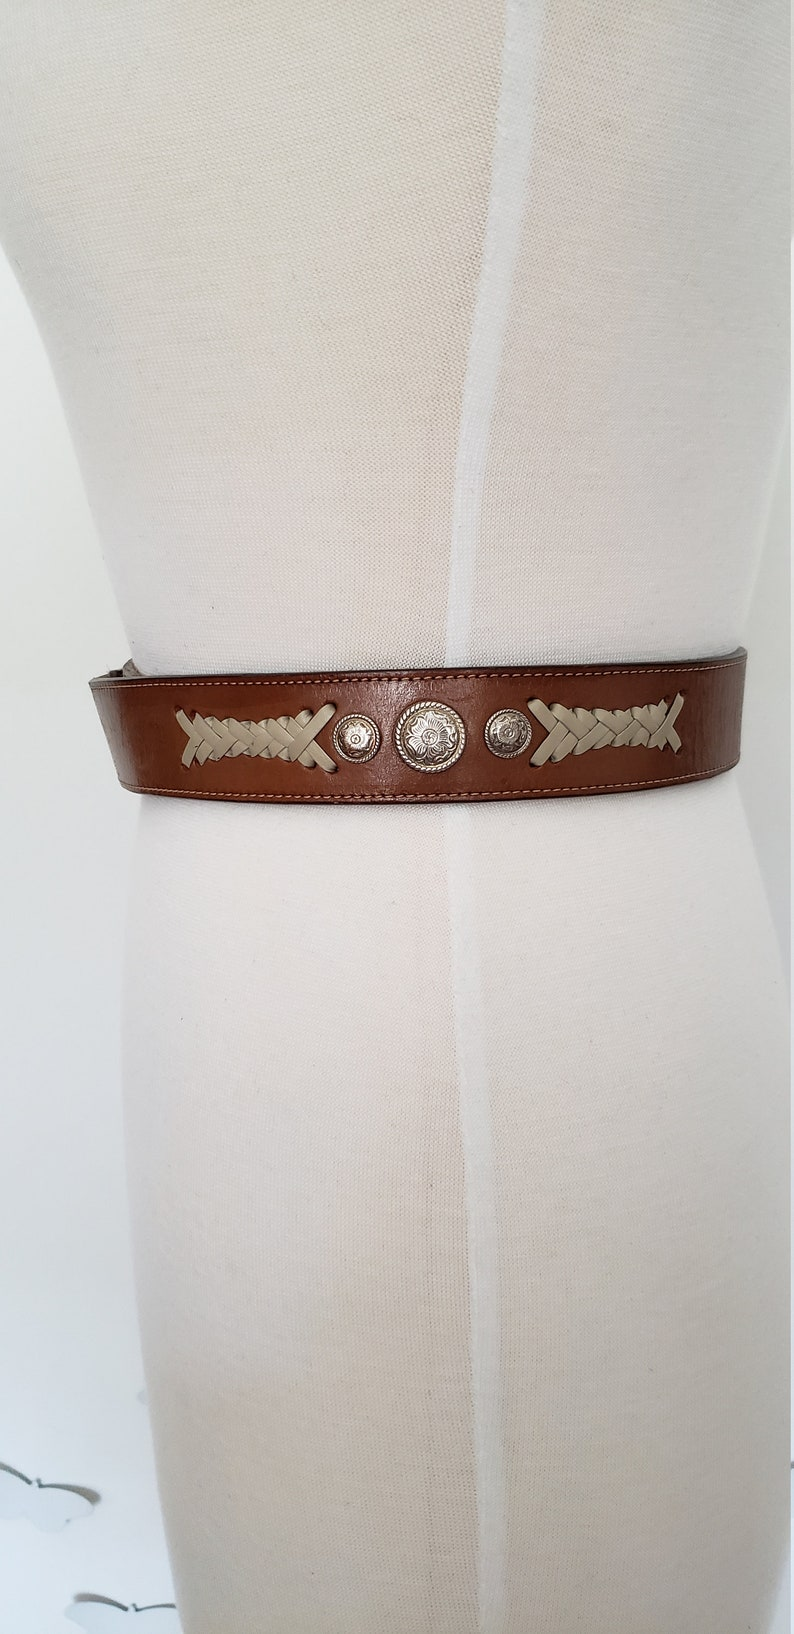 Vintage Unisex R Initial Brass Statement Buckle Belt Vintage Western Belt with Two Buckles Vintage Rodeo Men/'s Women/'s Leather Belt M L